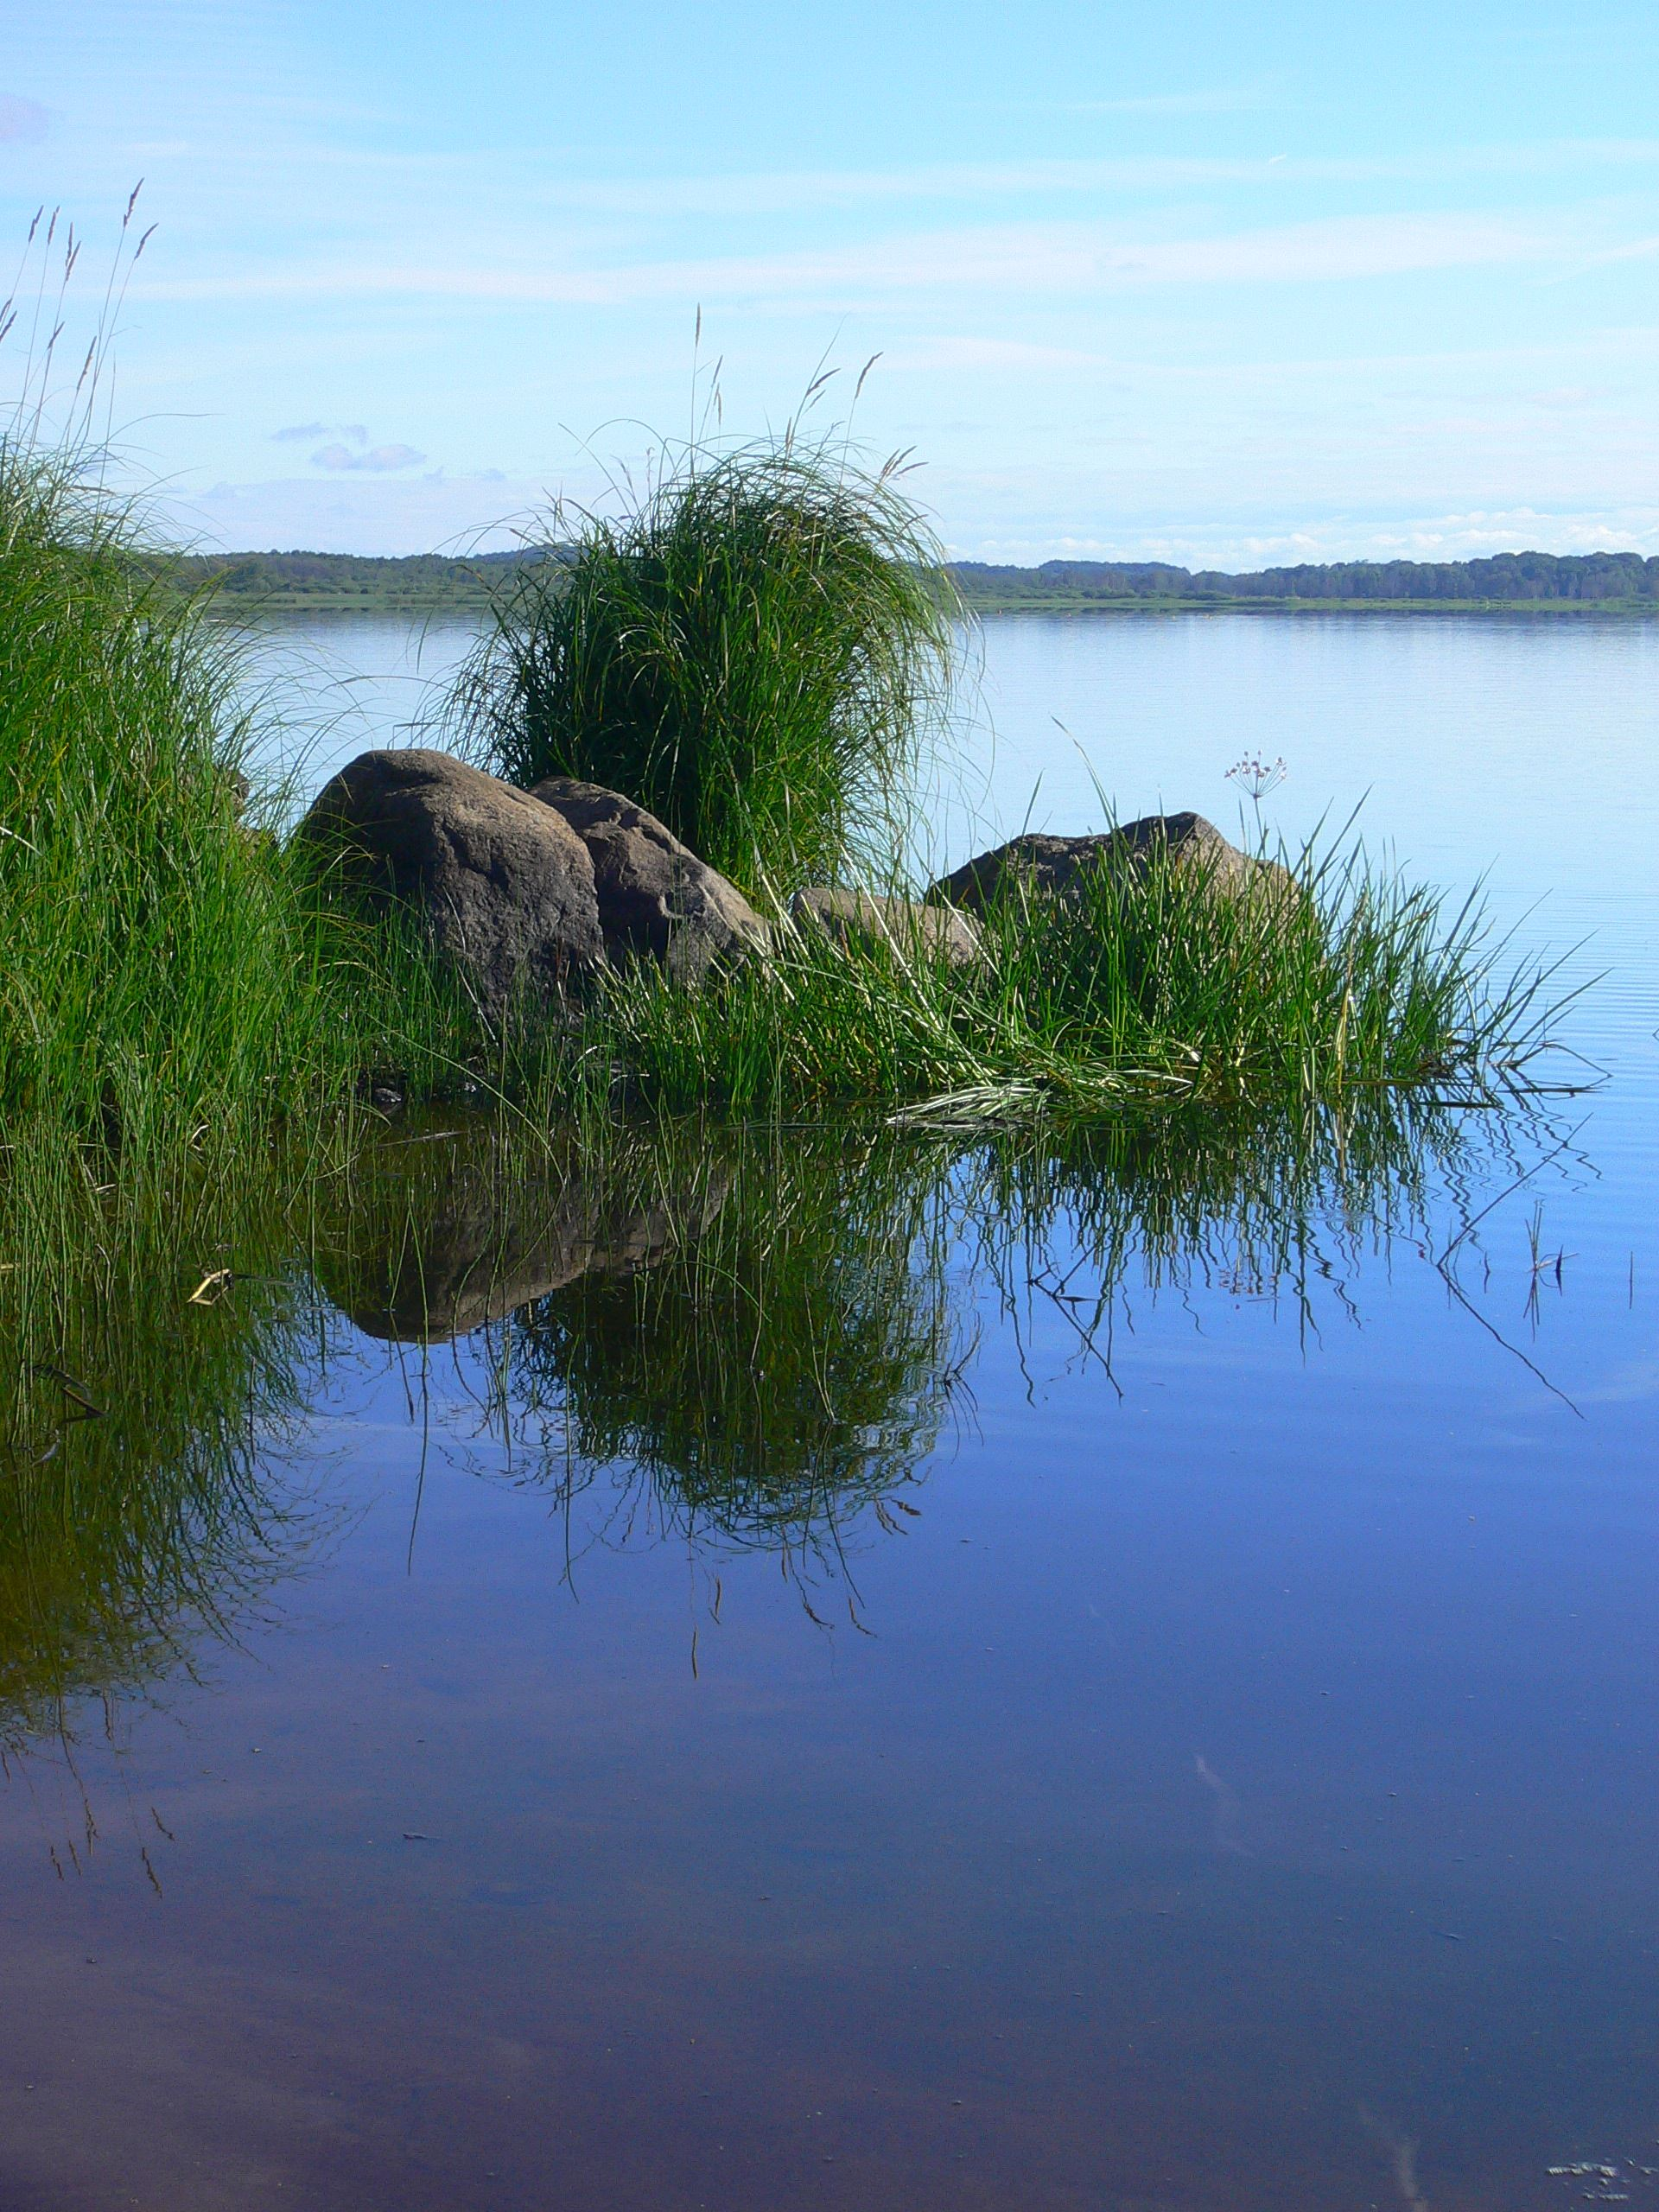 Finjasjöns historia